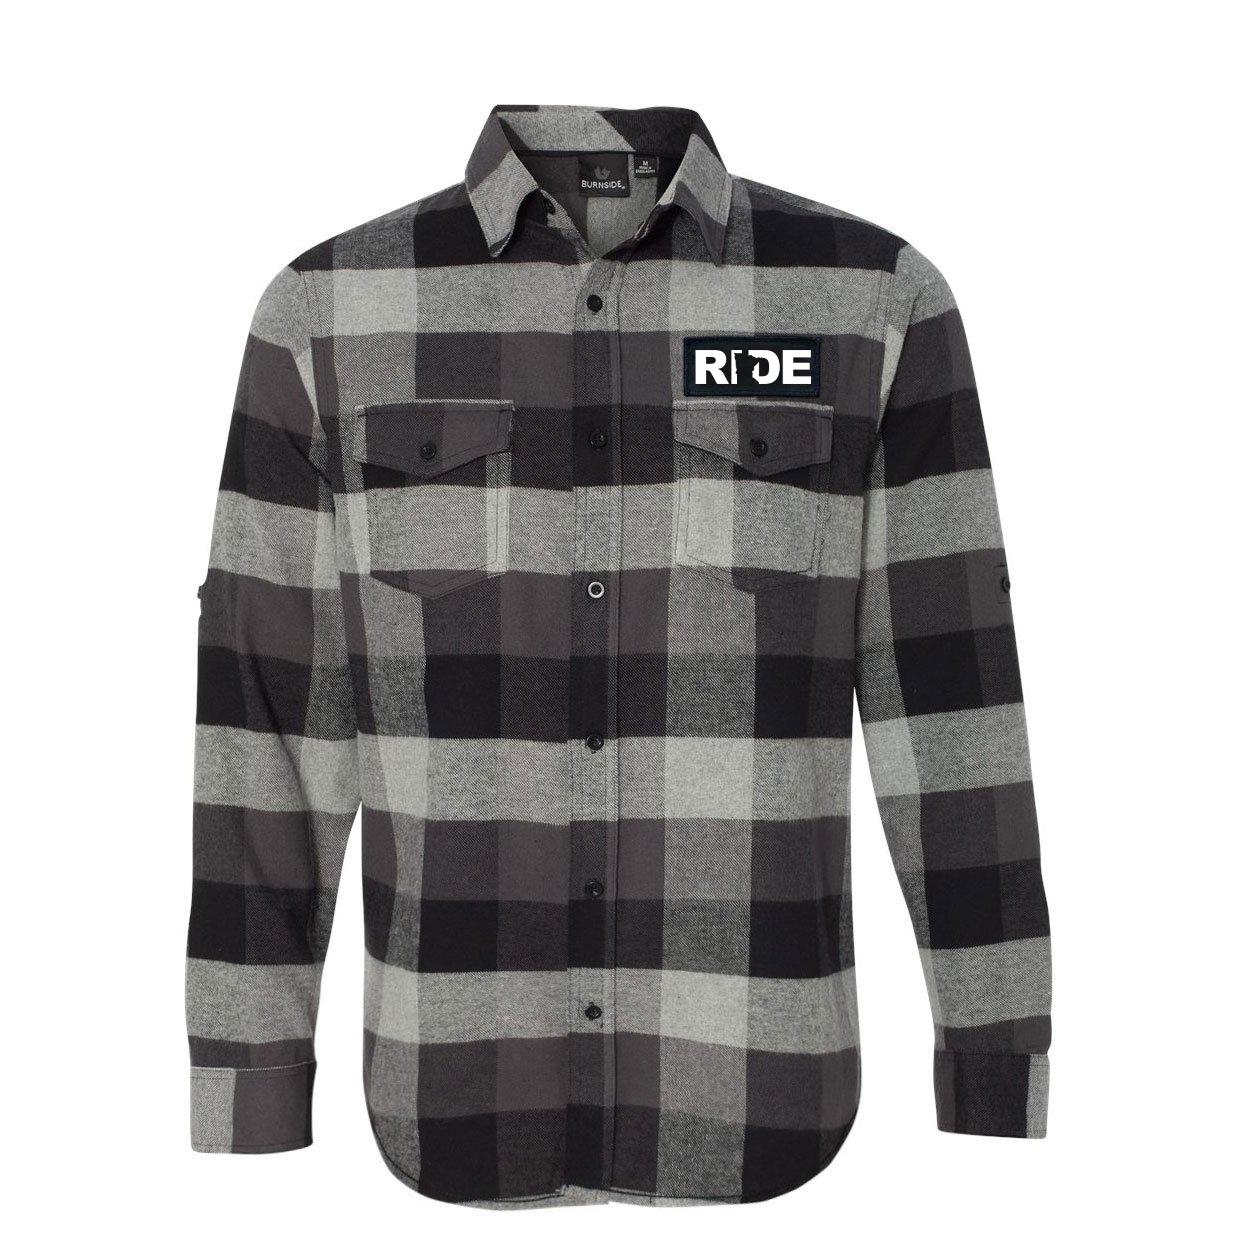 Ride Minnesota Classic Unisex Long Sleeve Woven Patch Flannel Shirt Black/Gray (White Logo)